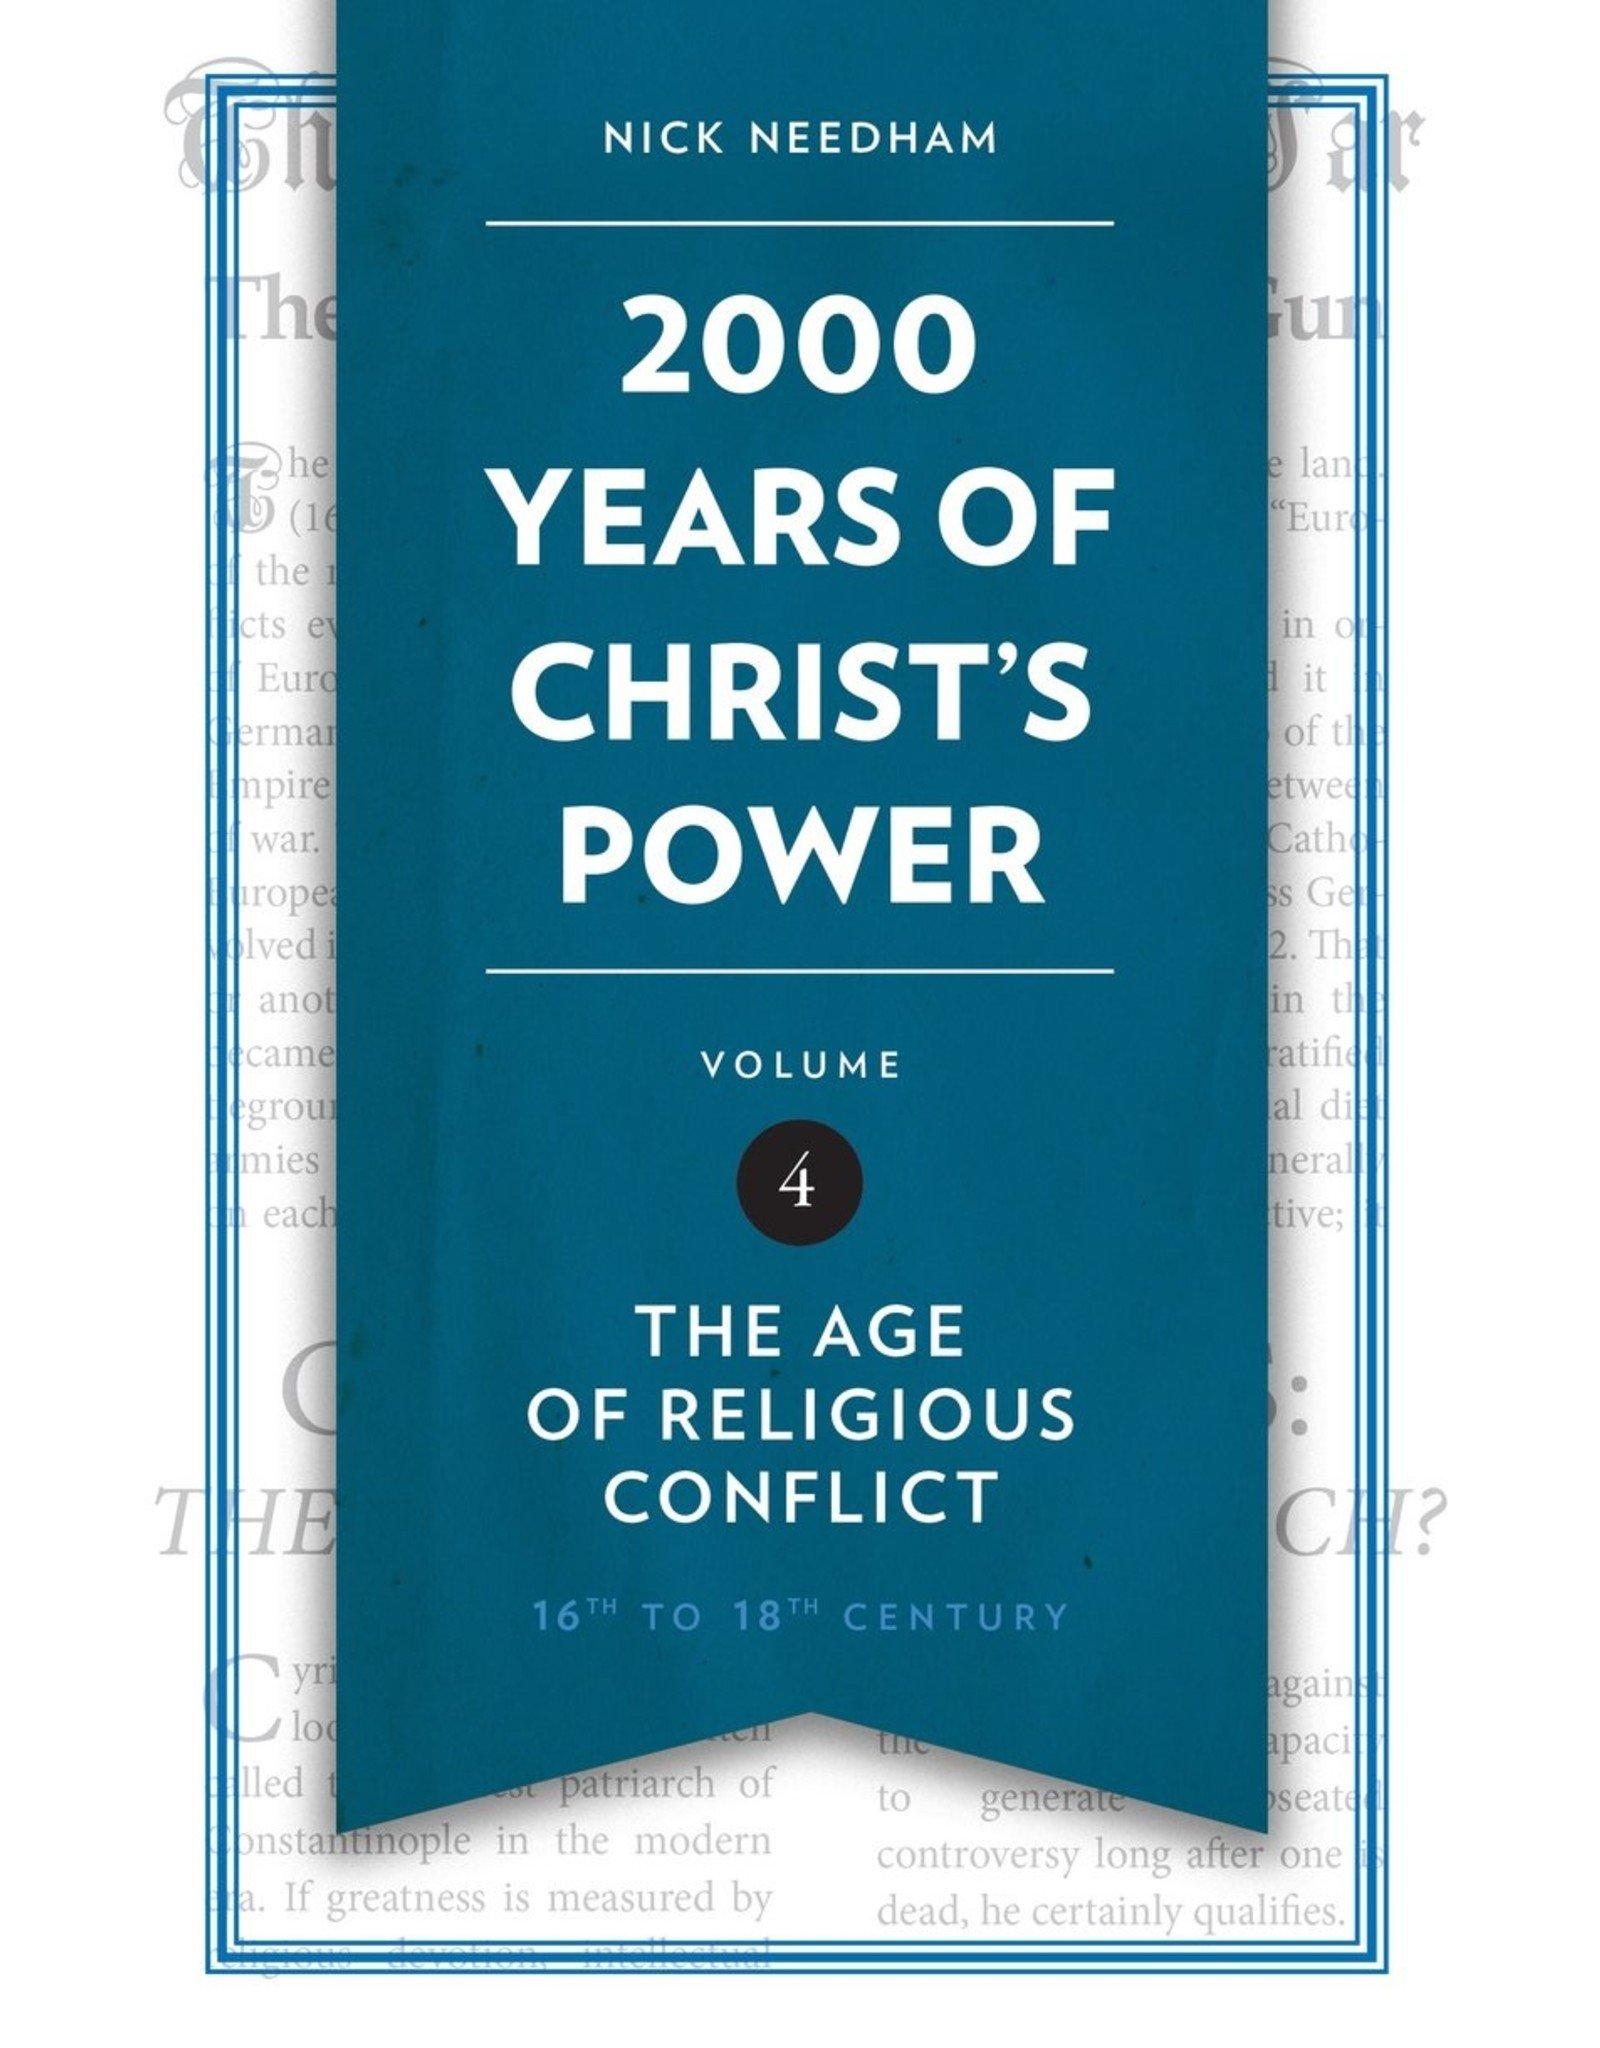 Christian Focus Publications (Atlas) 2000 Years of Christ's Power (Volume 4, Paperback)